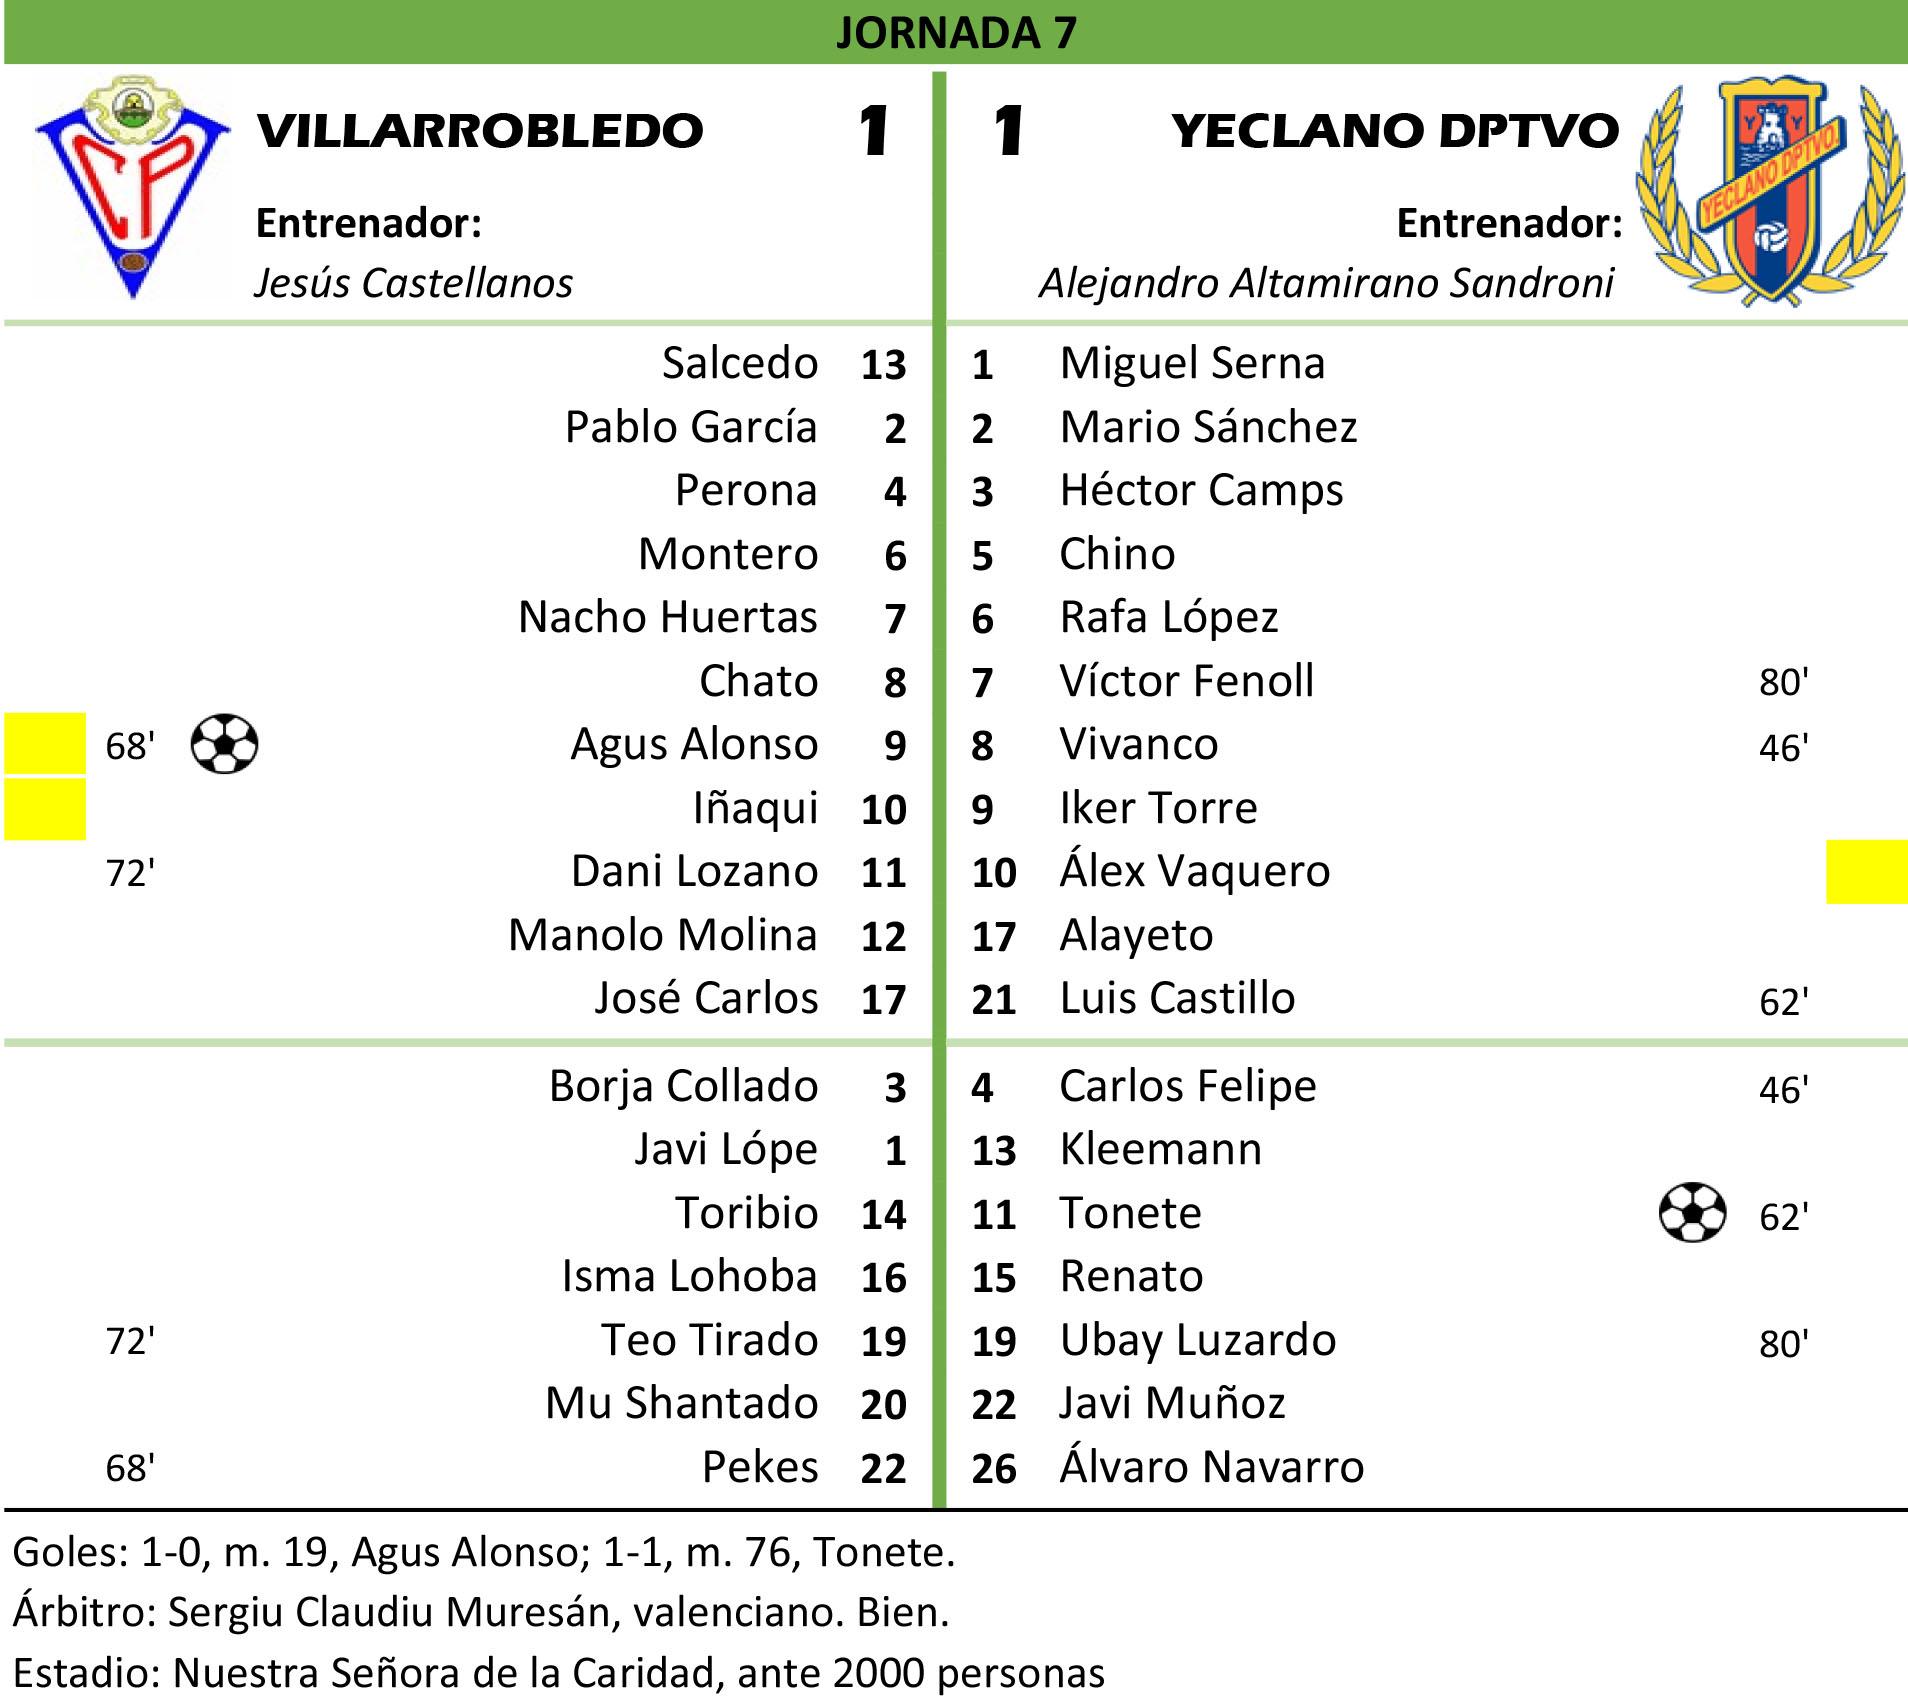 YeclaSPort_Ficha_Villarrobledo_Yeclano